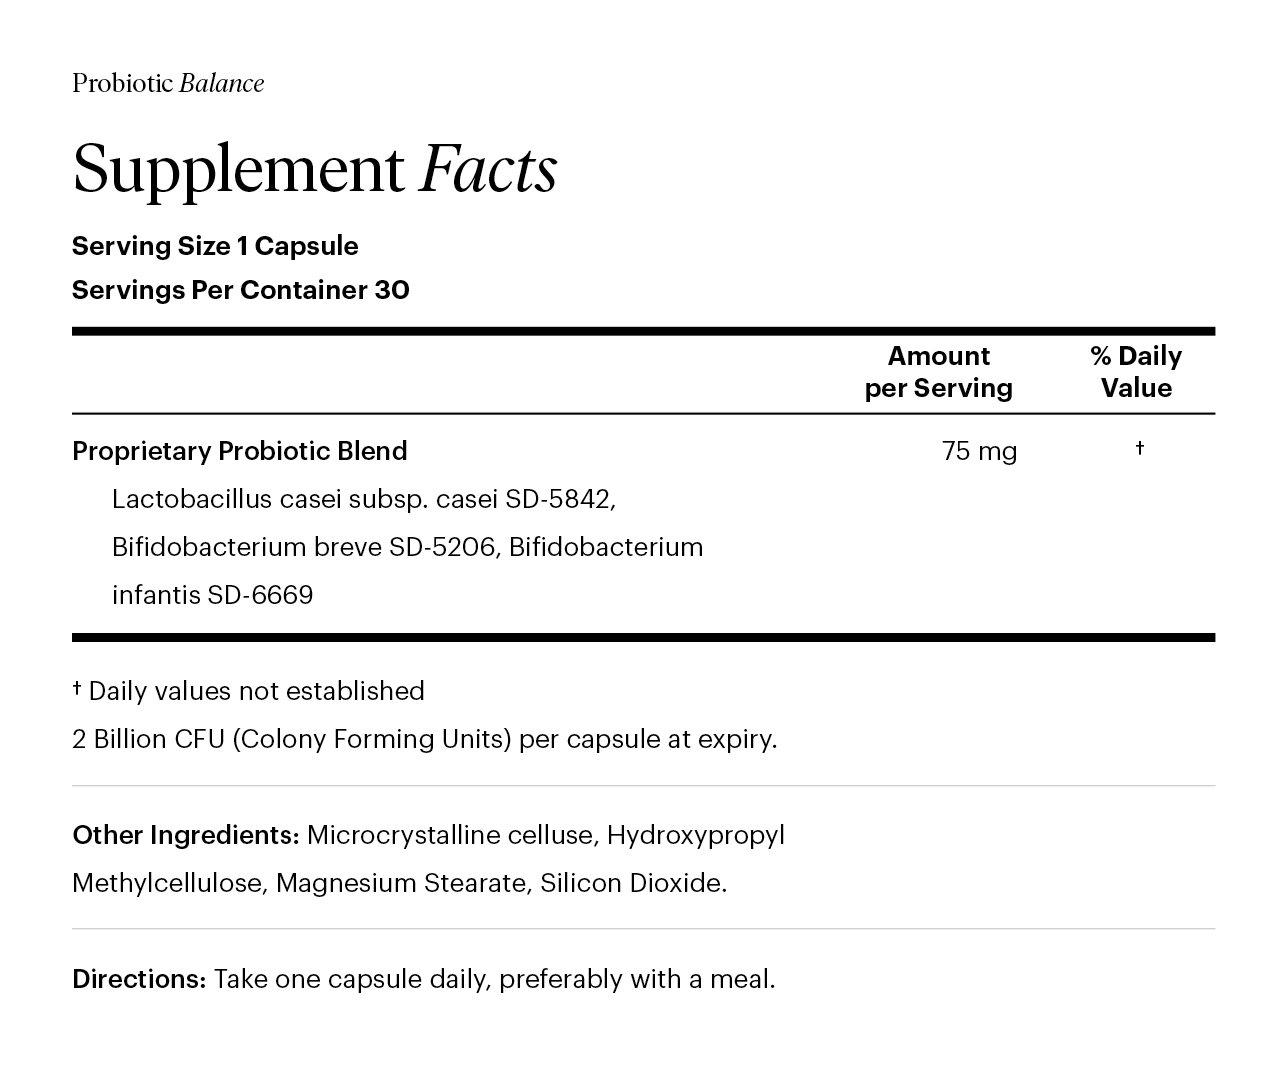 Probiotic Supplement Facts